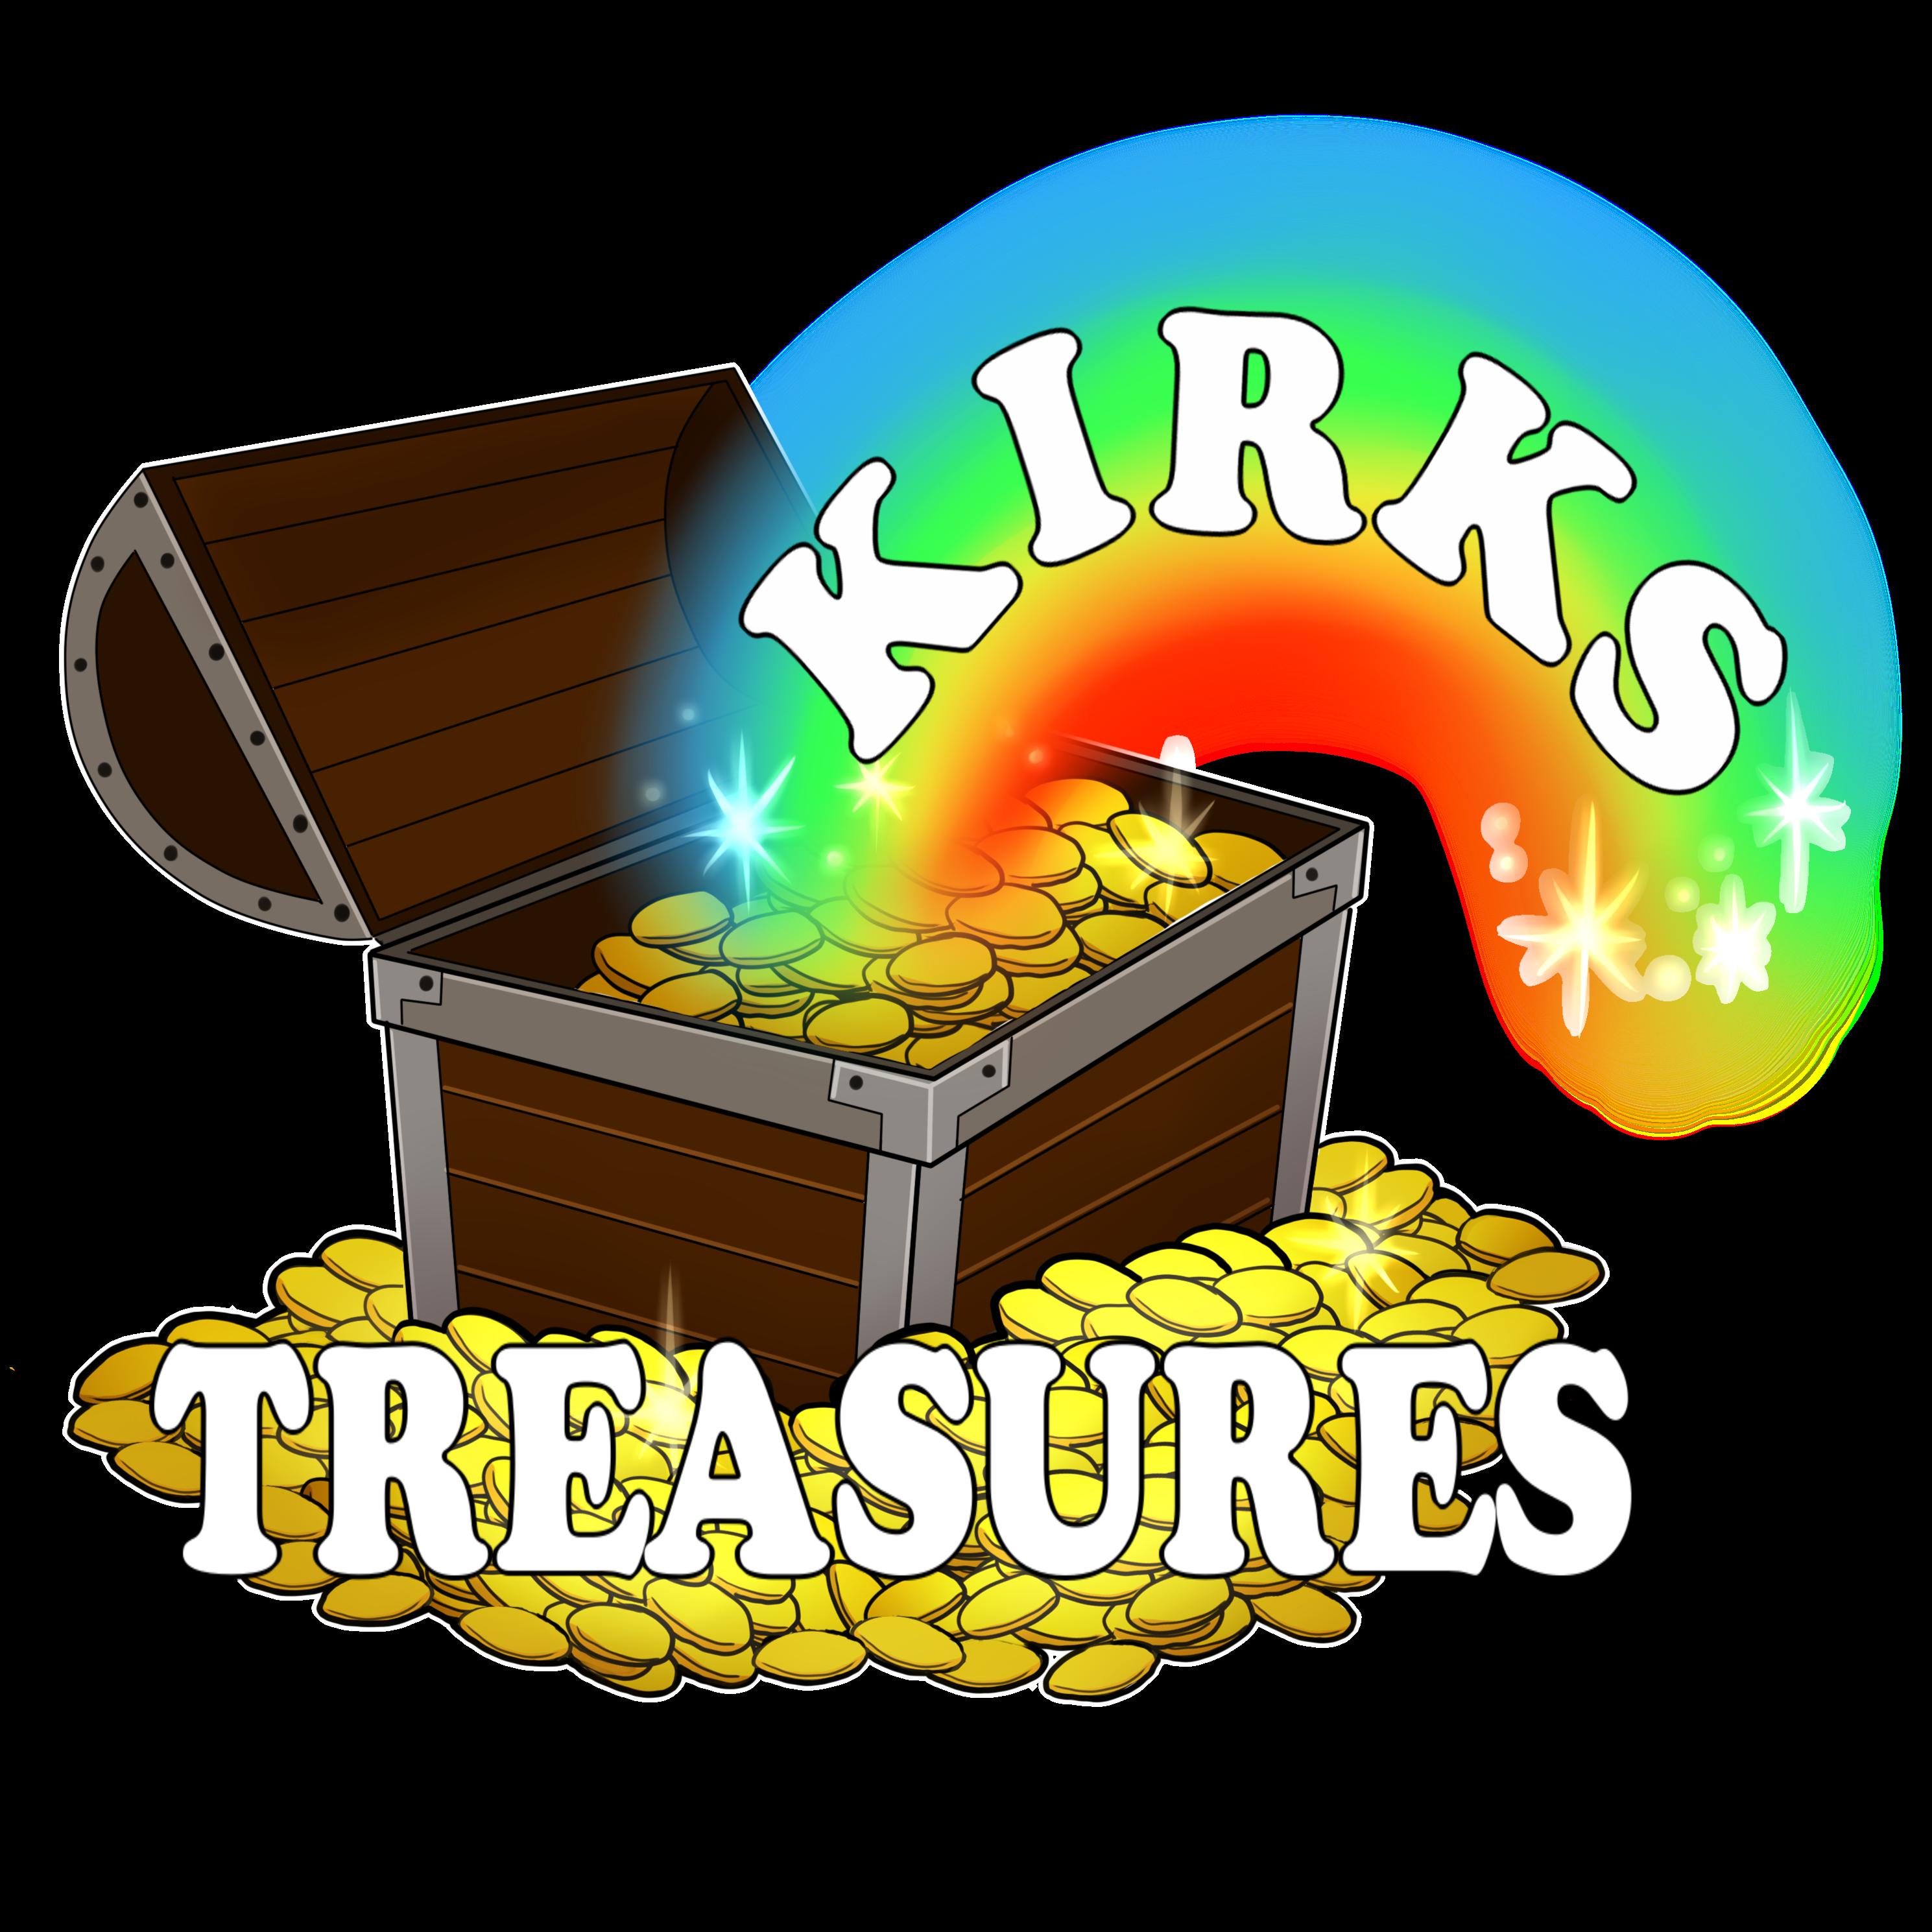 kirkstreasures